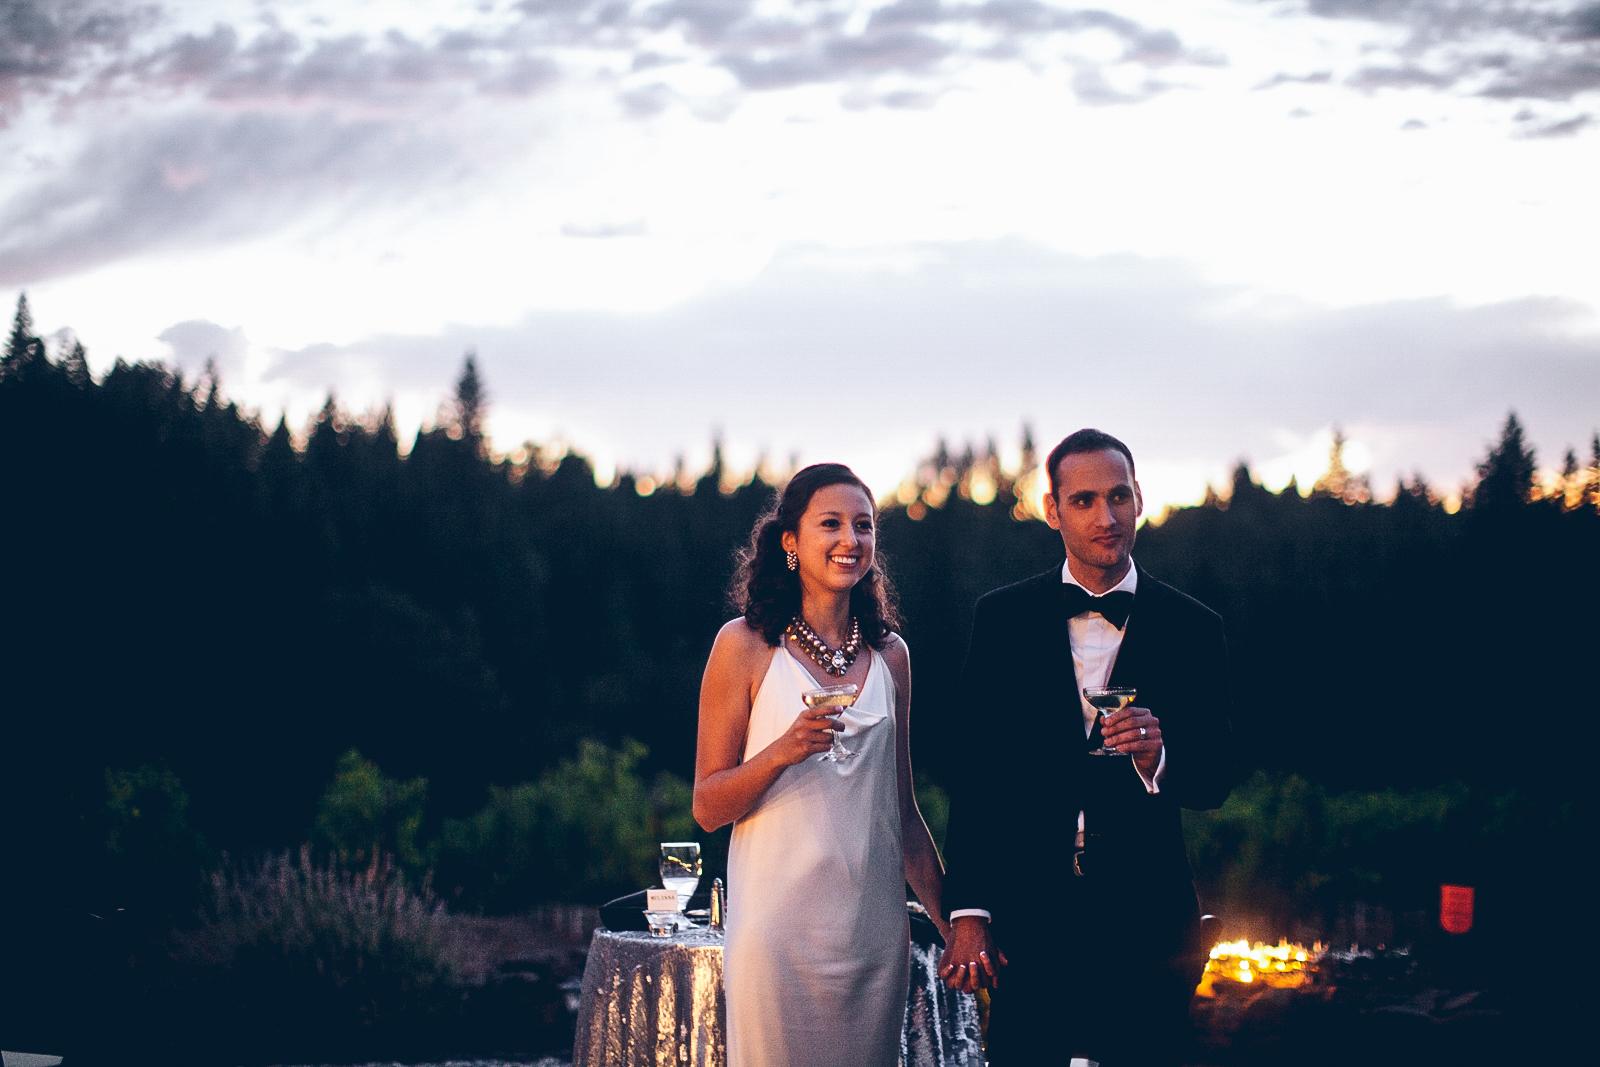 miraflores_winery_wedding_photography_ian_melissa_ebony_siovhan_bokeh_photography_72.jpg